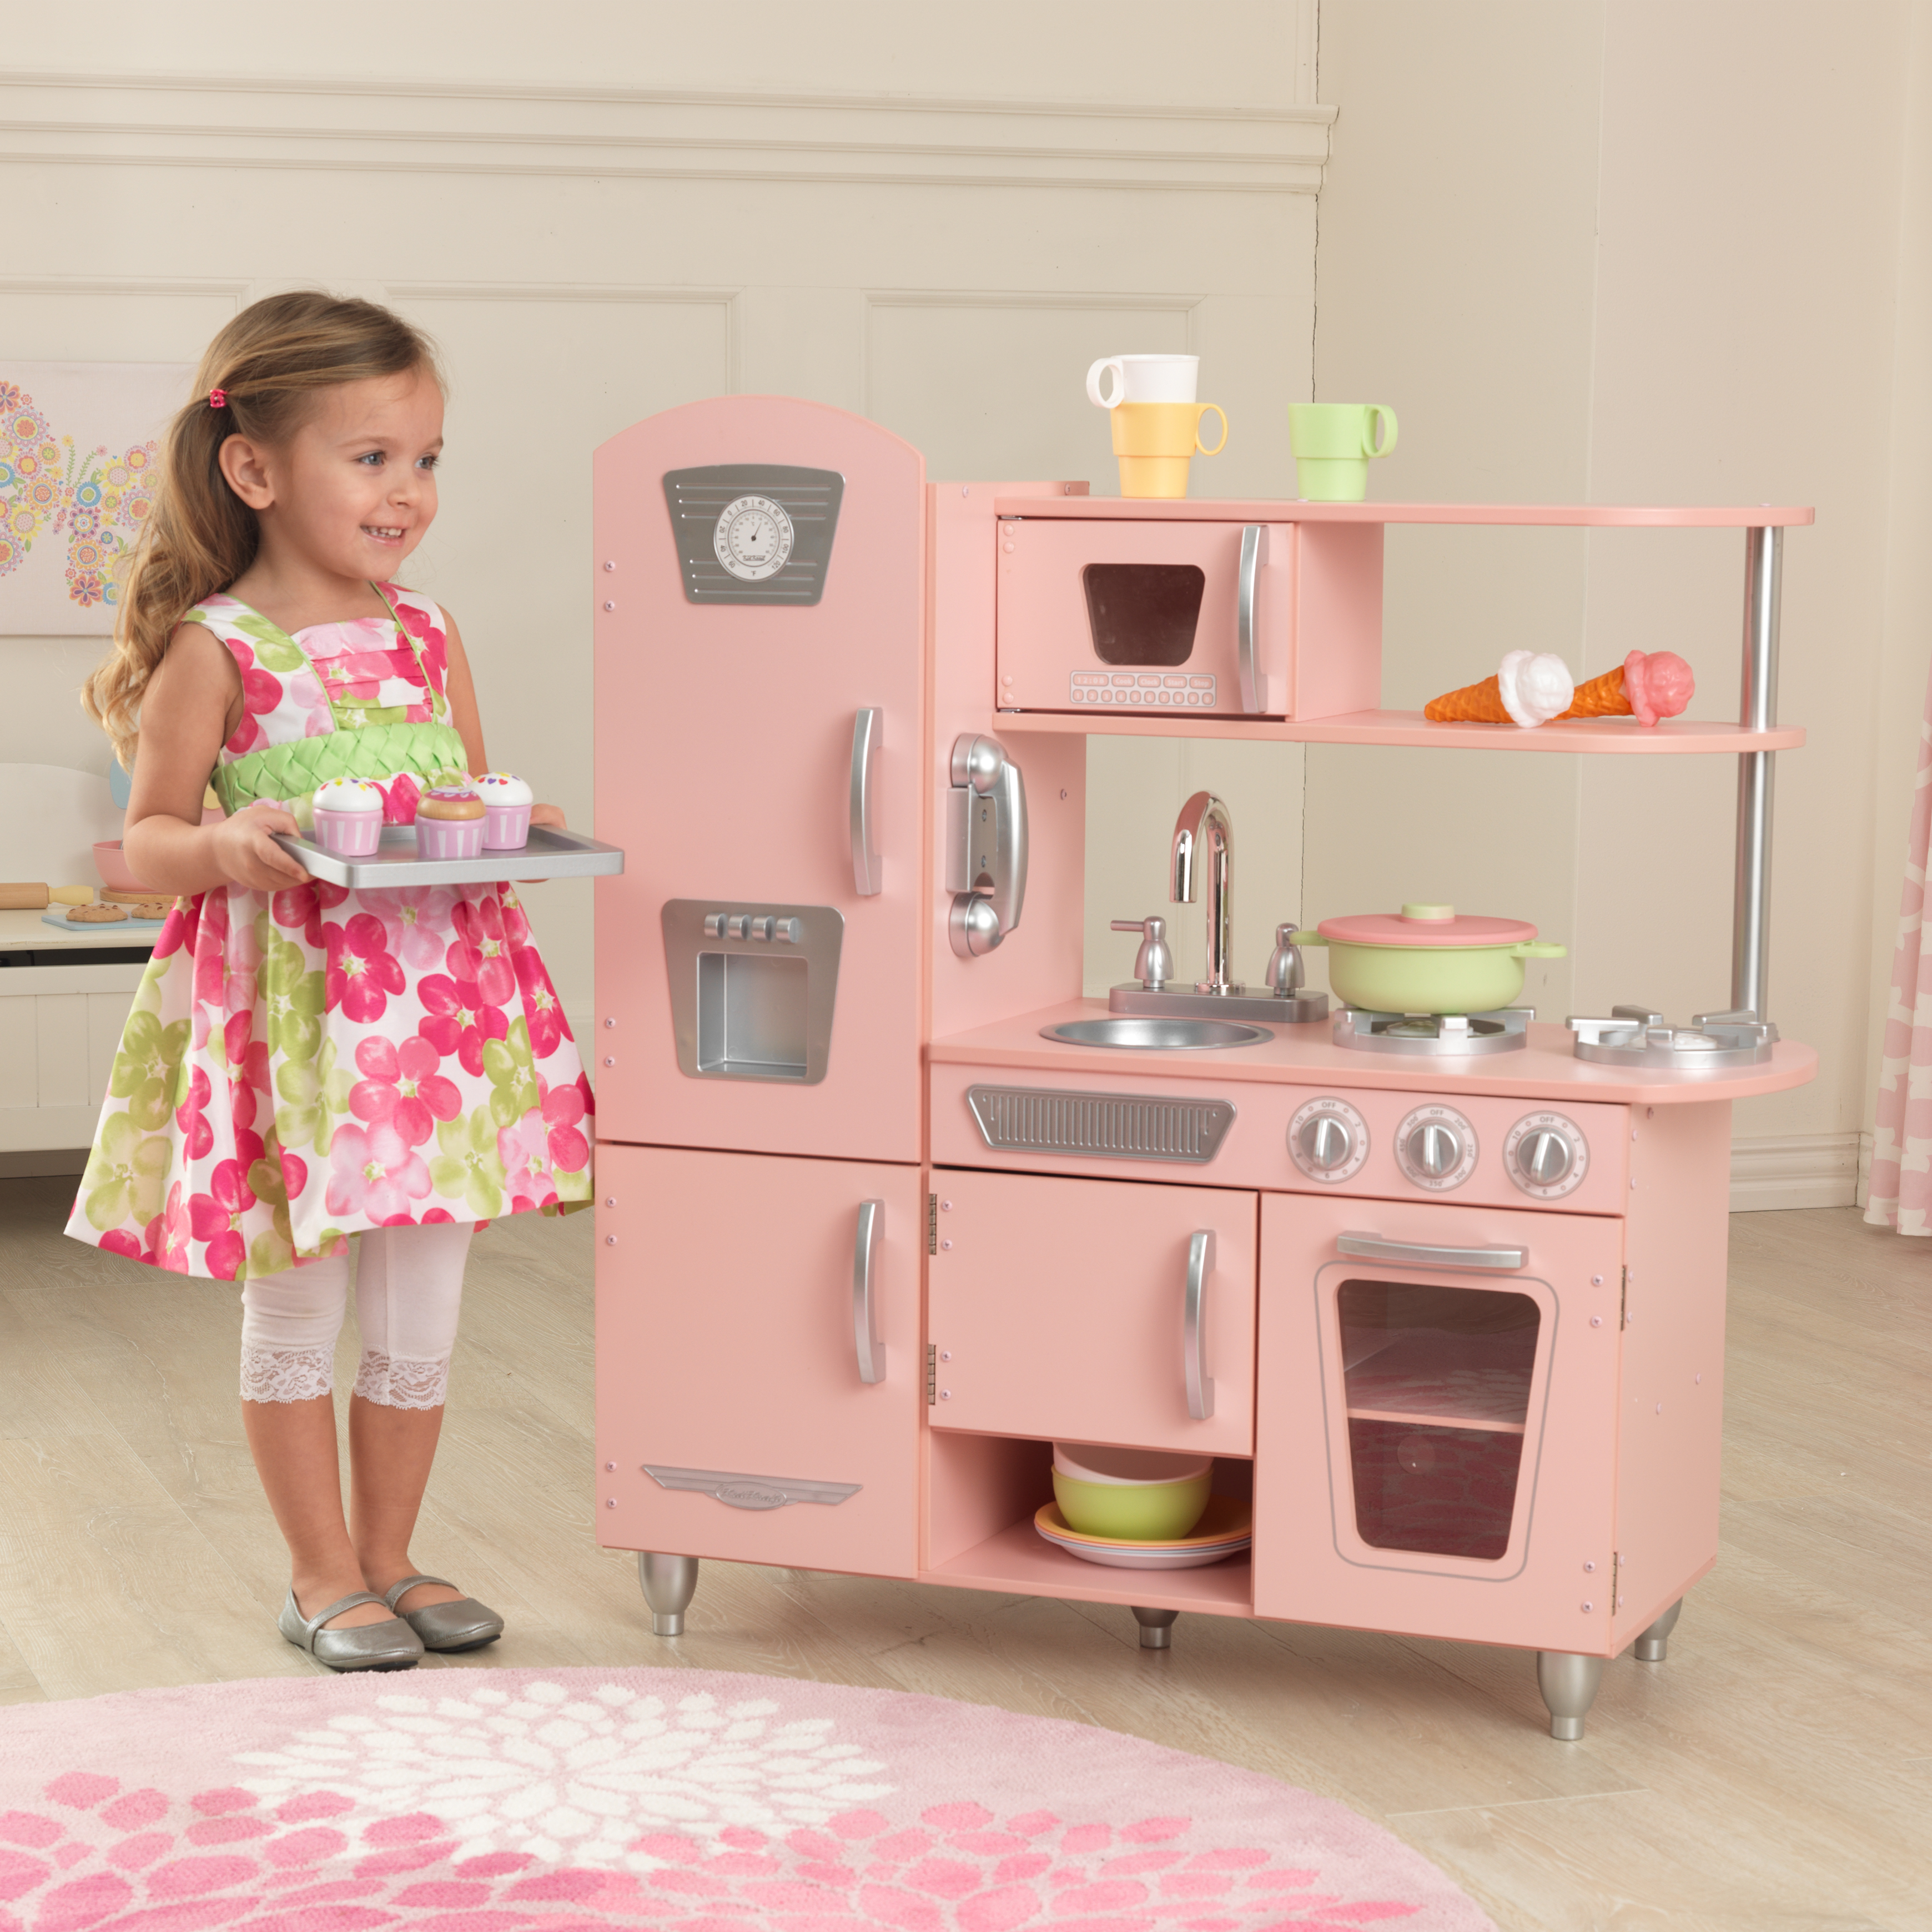 kidkraft - barnkök - pink vintage kitchen - litenleker.se